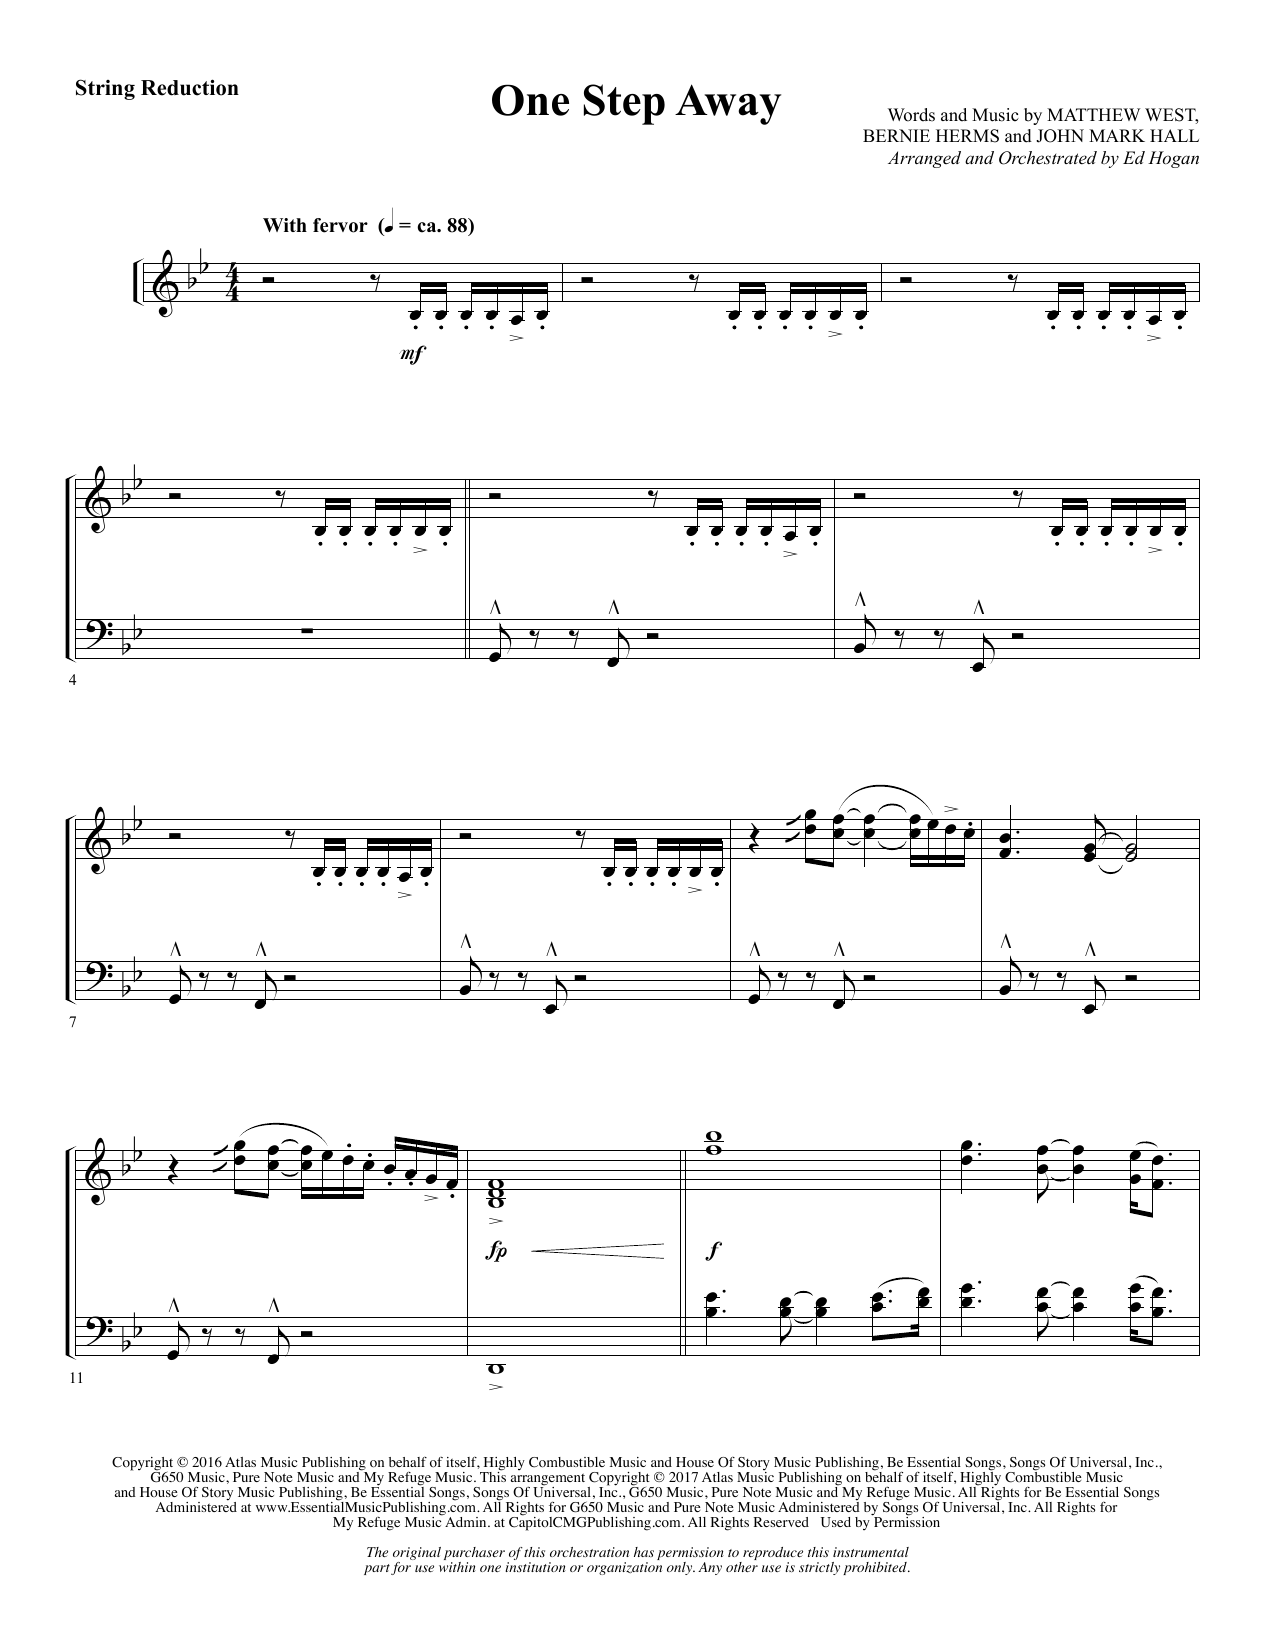 Ed Hogan One Step Away - Keyboard String Reduction sheet music notes and chords. Download Printable PDF.